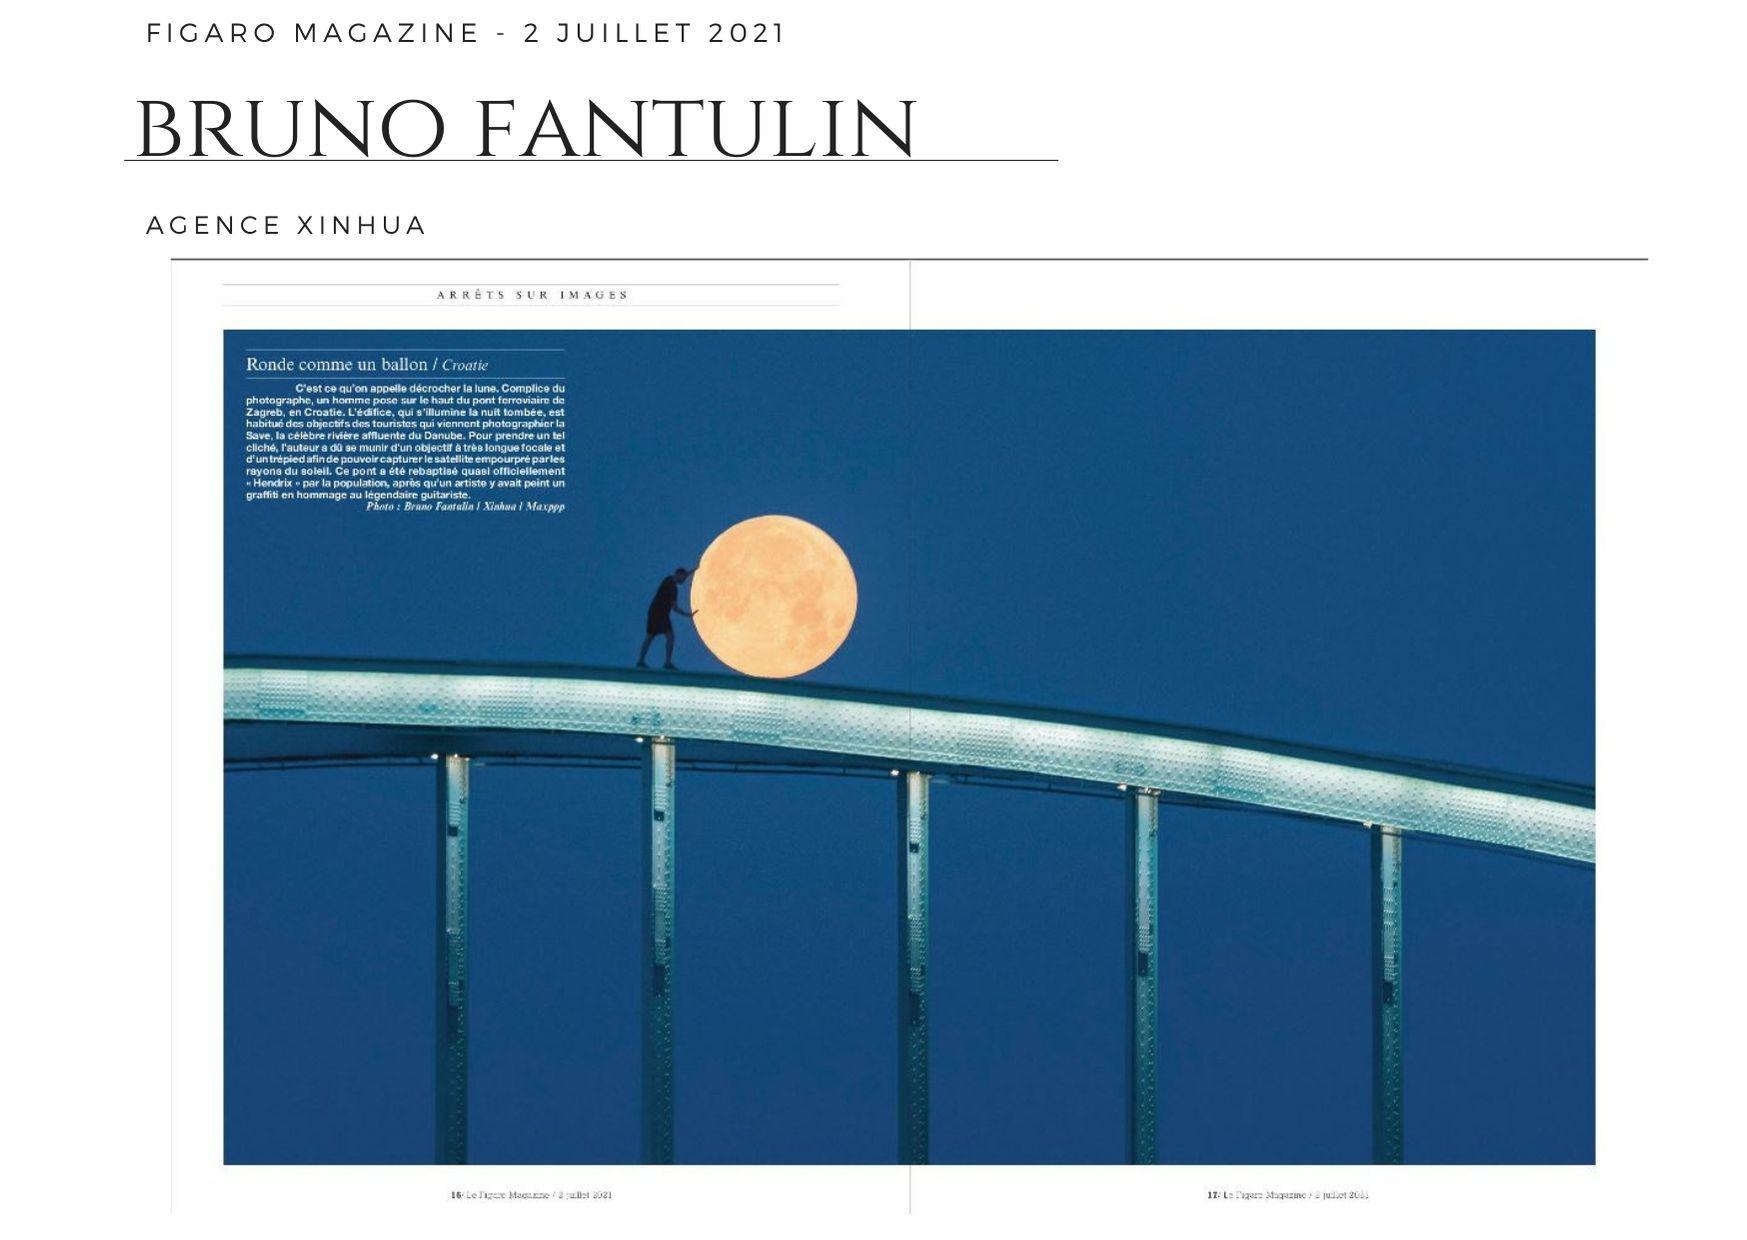 Figaro Magazine - 2 juillet 2021